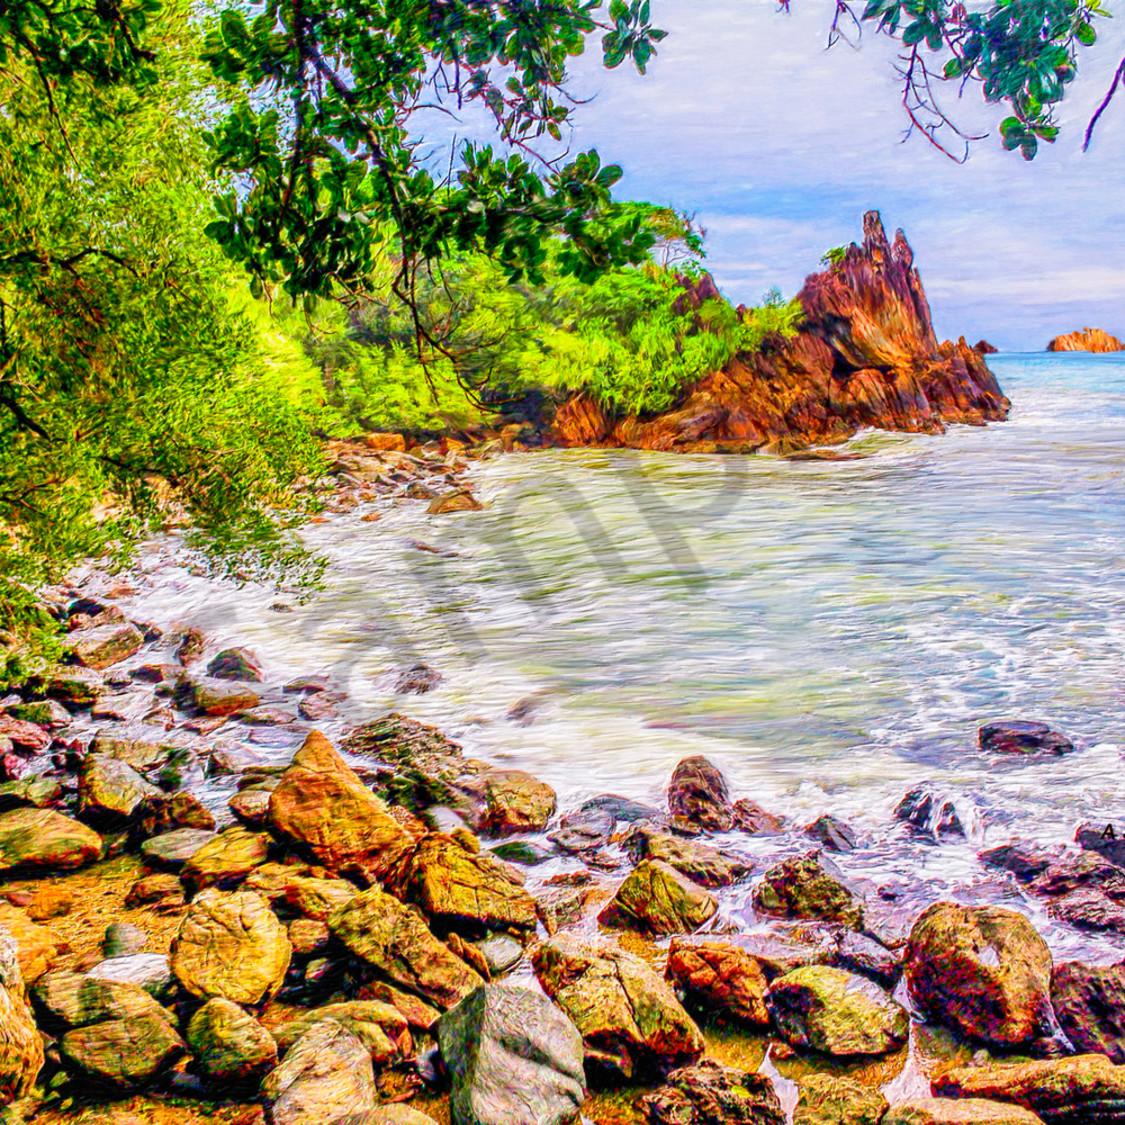 Beach rocks d75hse